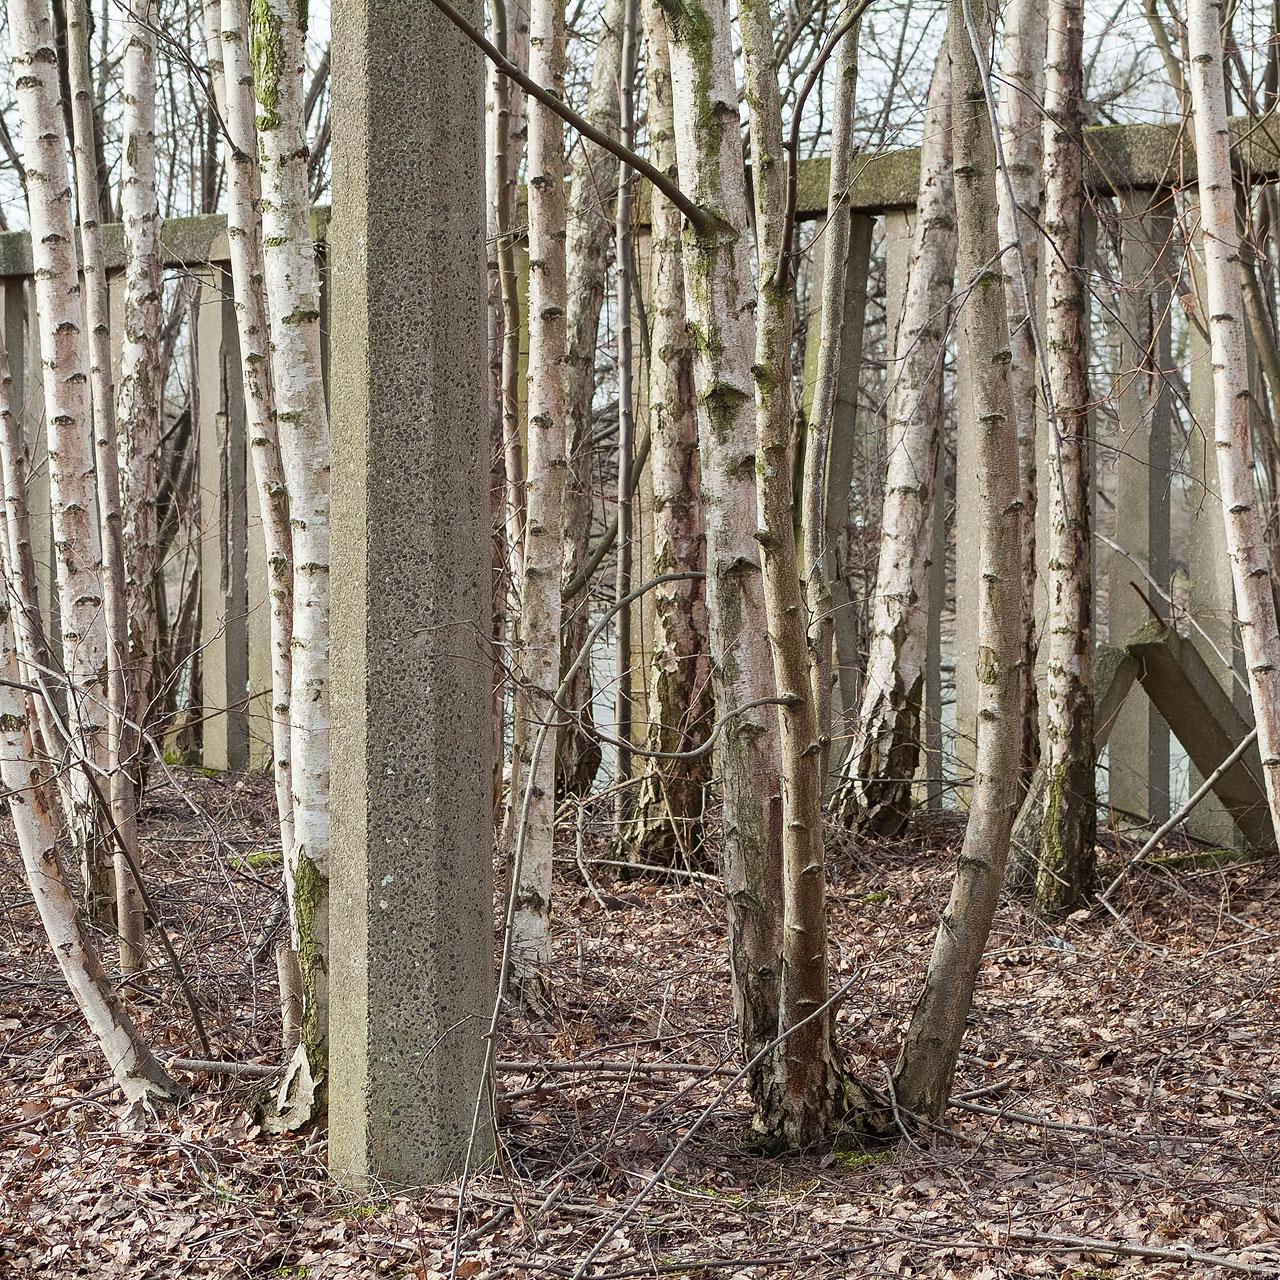 Mark Wohlrab - Industriewald Ruhrgebiet - Felix Schoeller Photoaward